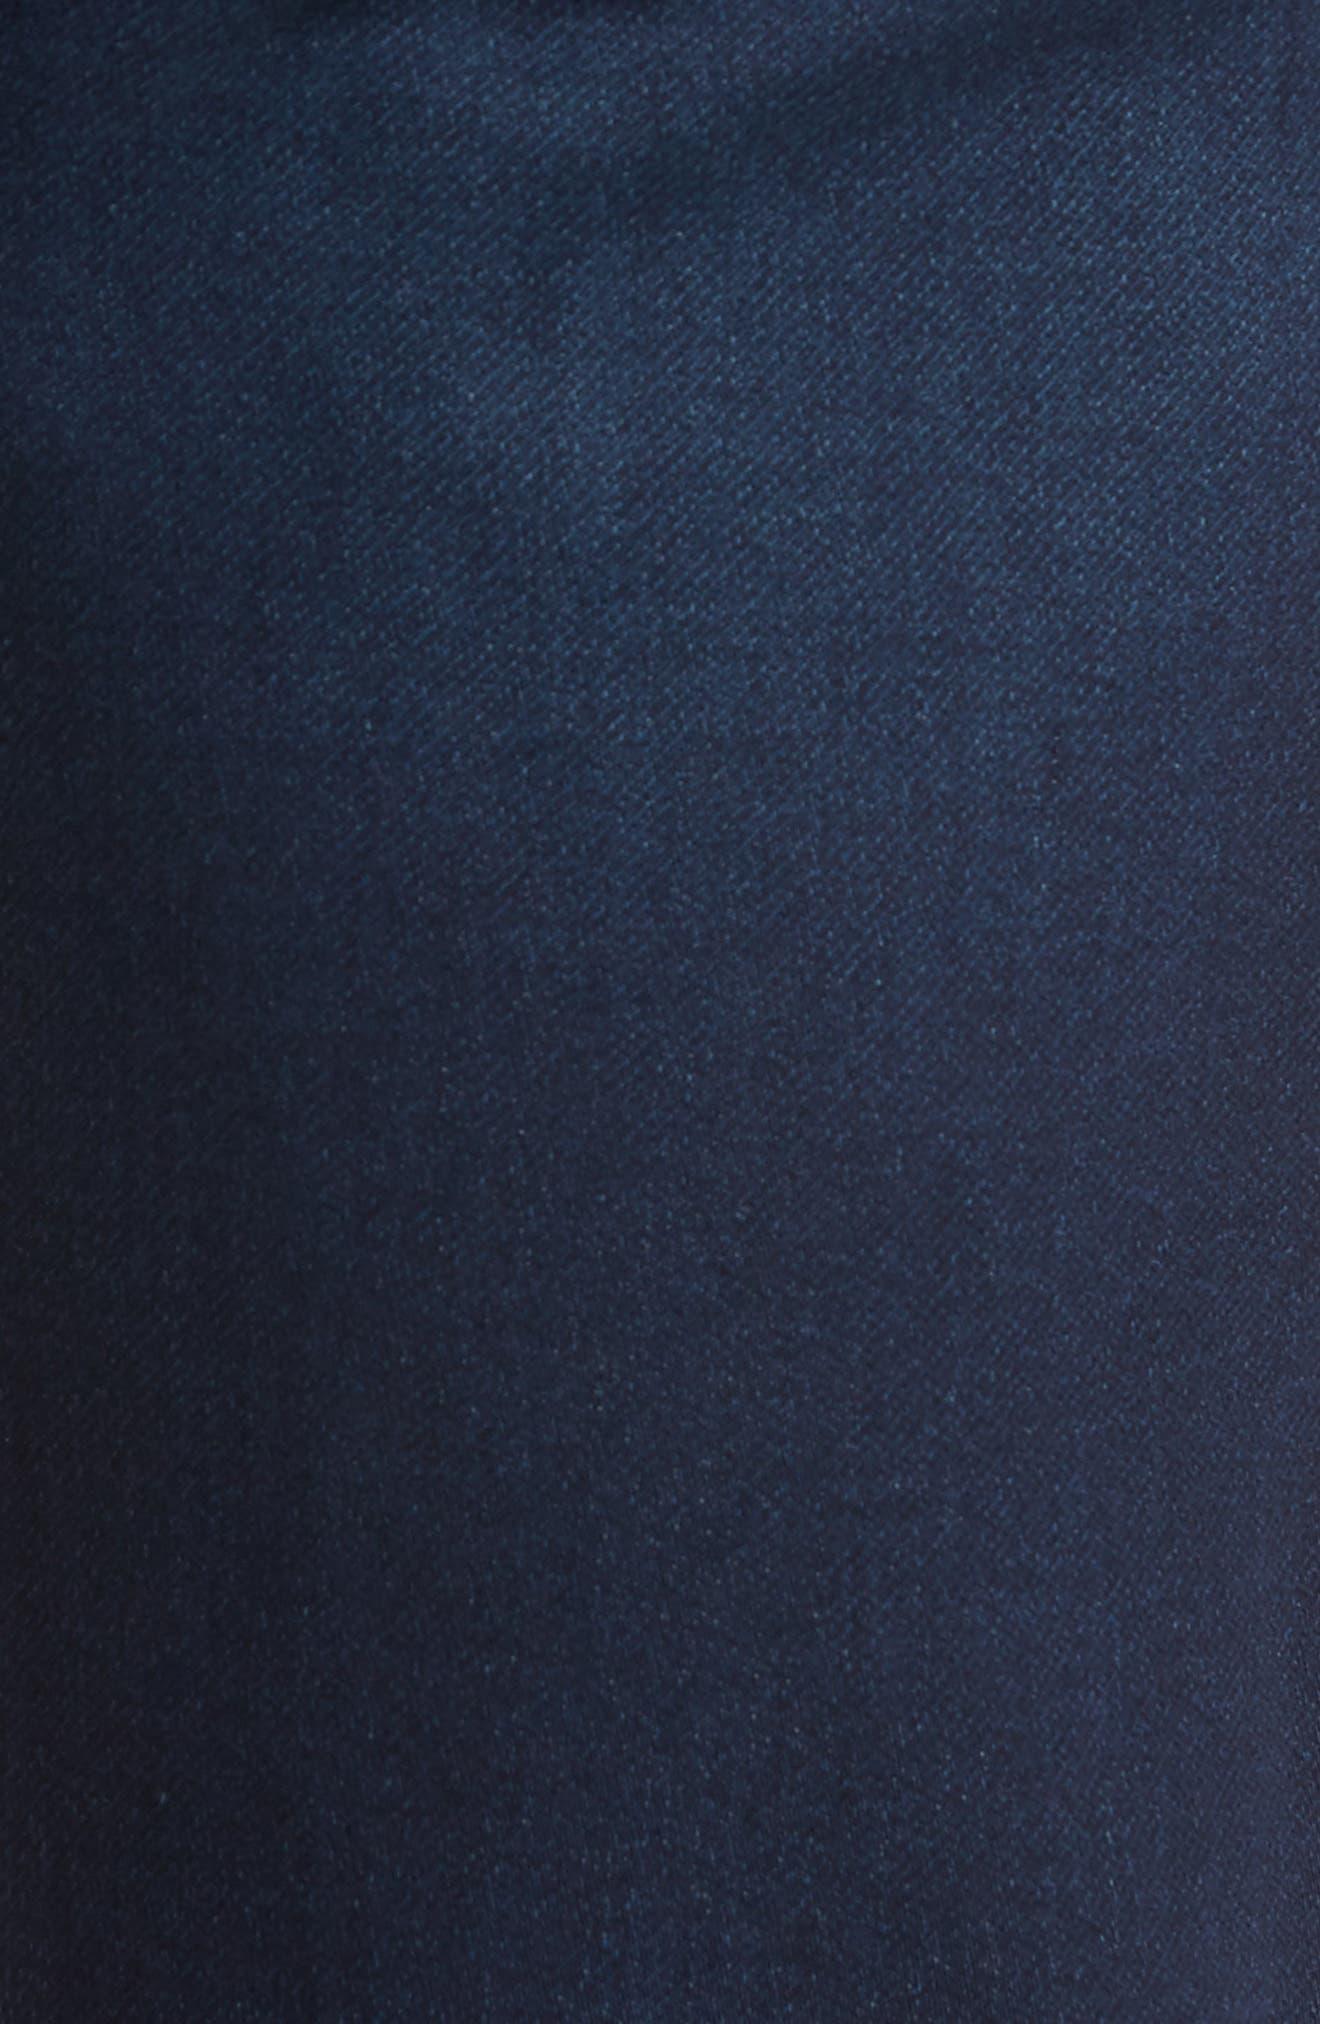 Torino Slim Fit Jeans,                             Alternate thumbnail 5, color,                             Lemmy Blue